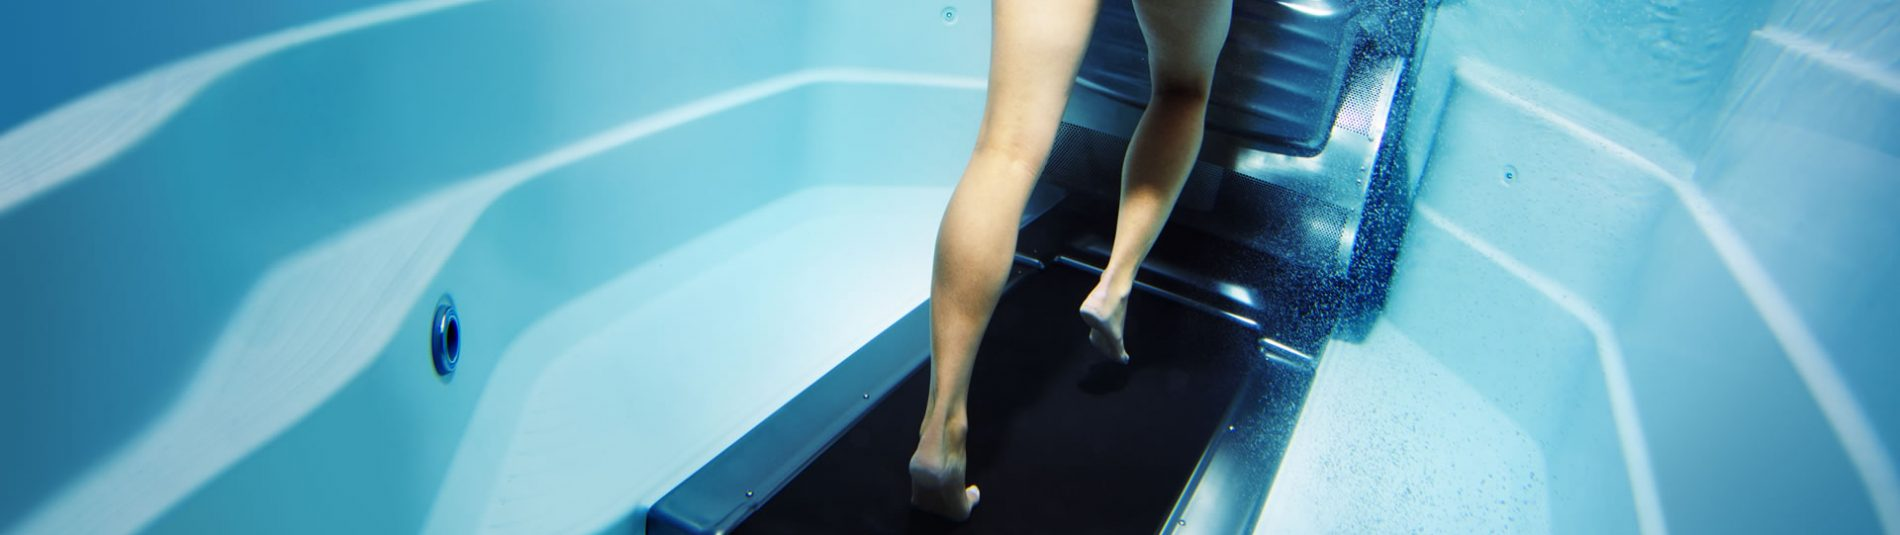 Use a Lap Pool to Reach Your Fitness Goals – Swim Spas Des Moines